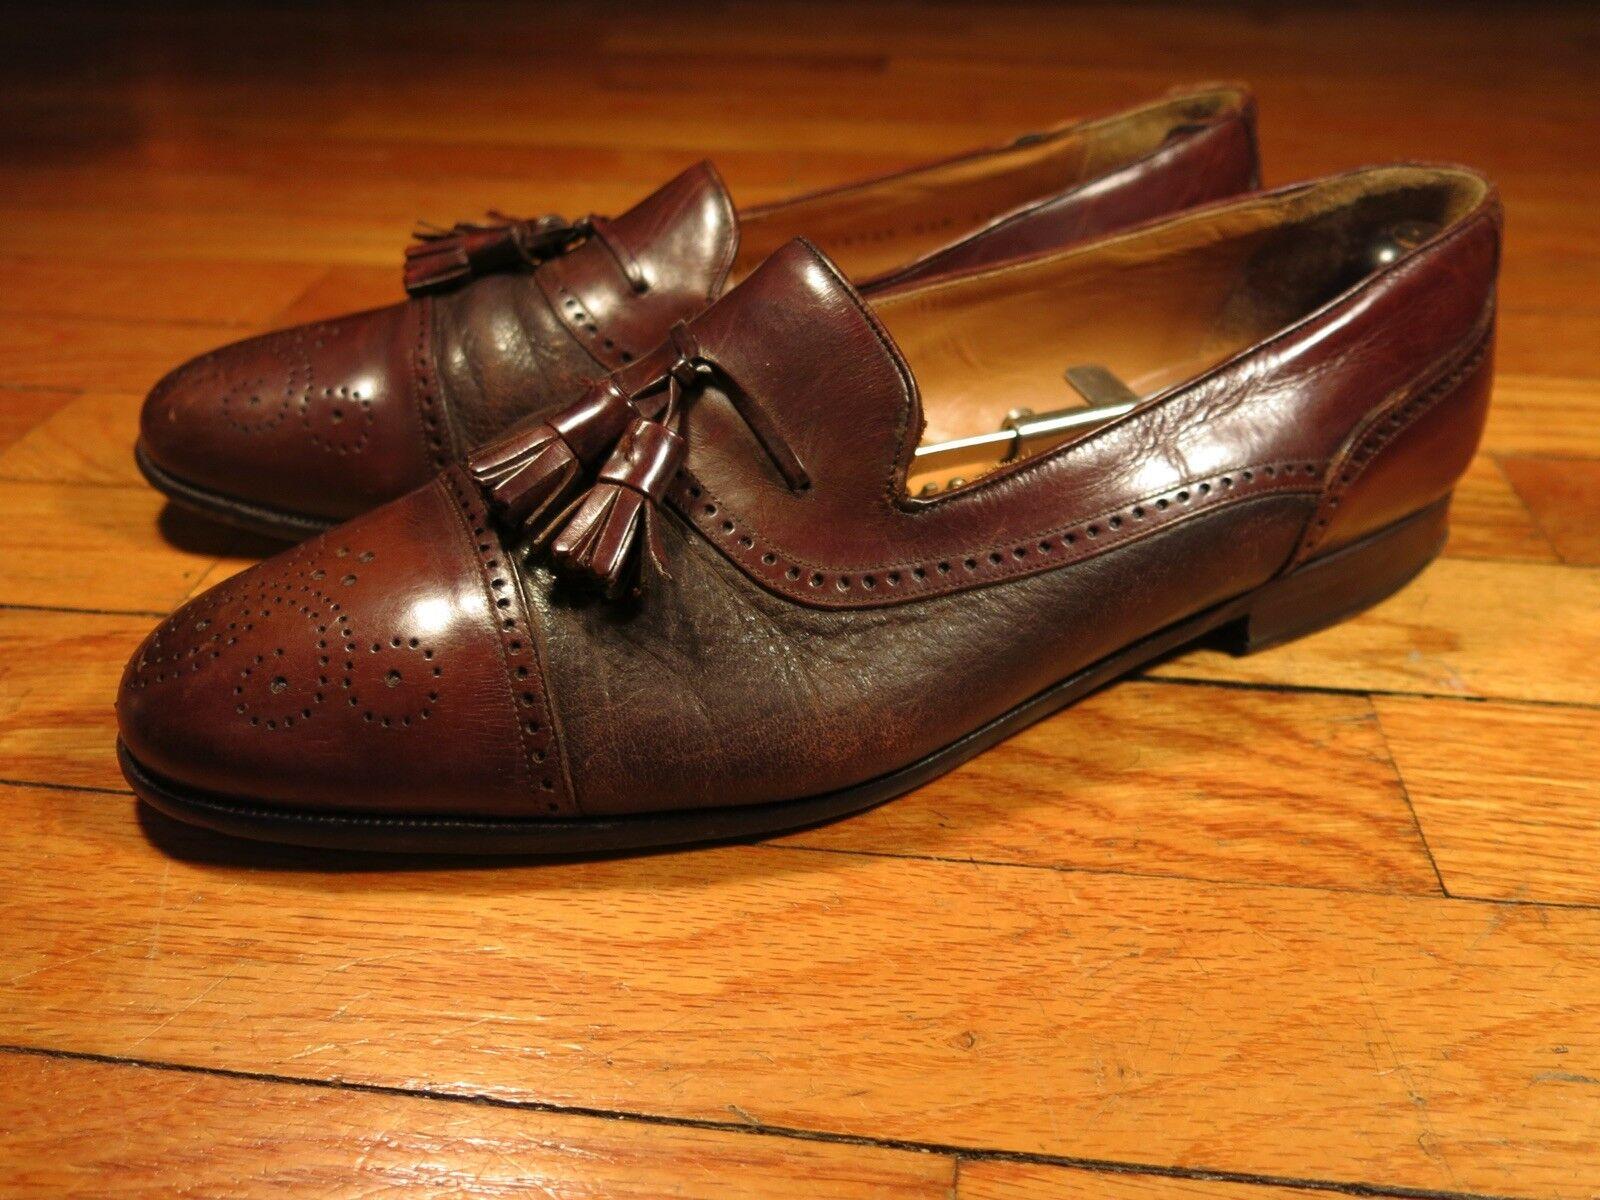 Toe Herren 11 D Mezlan Havana Brogued Cap Toe  Tassel Loafers Braun Leder Spain d99b96